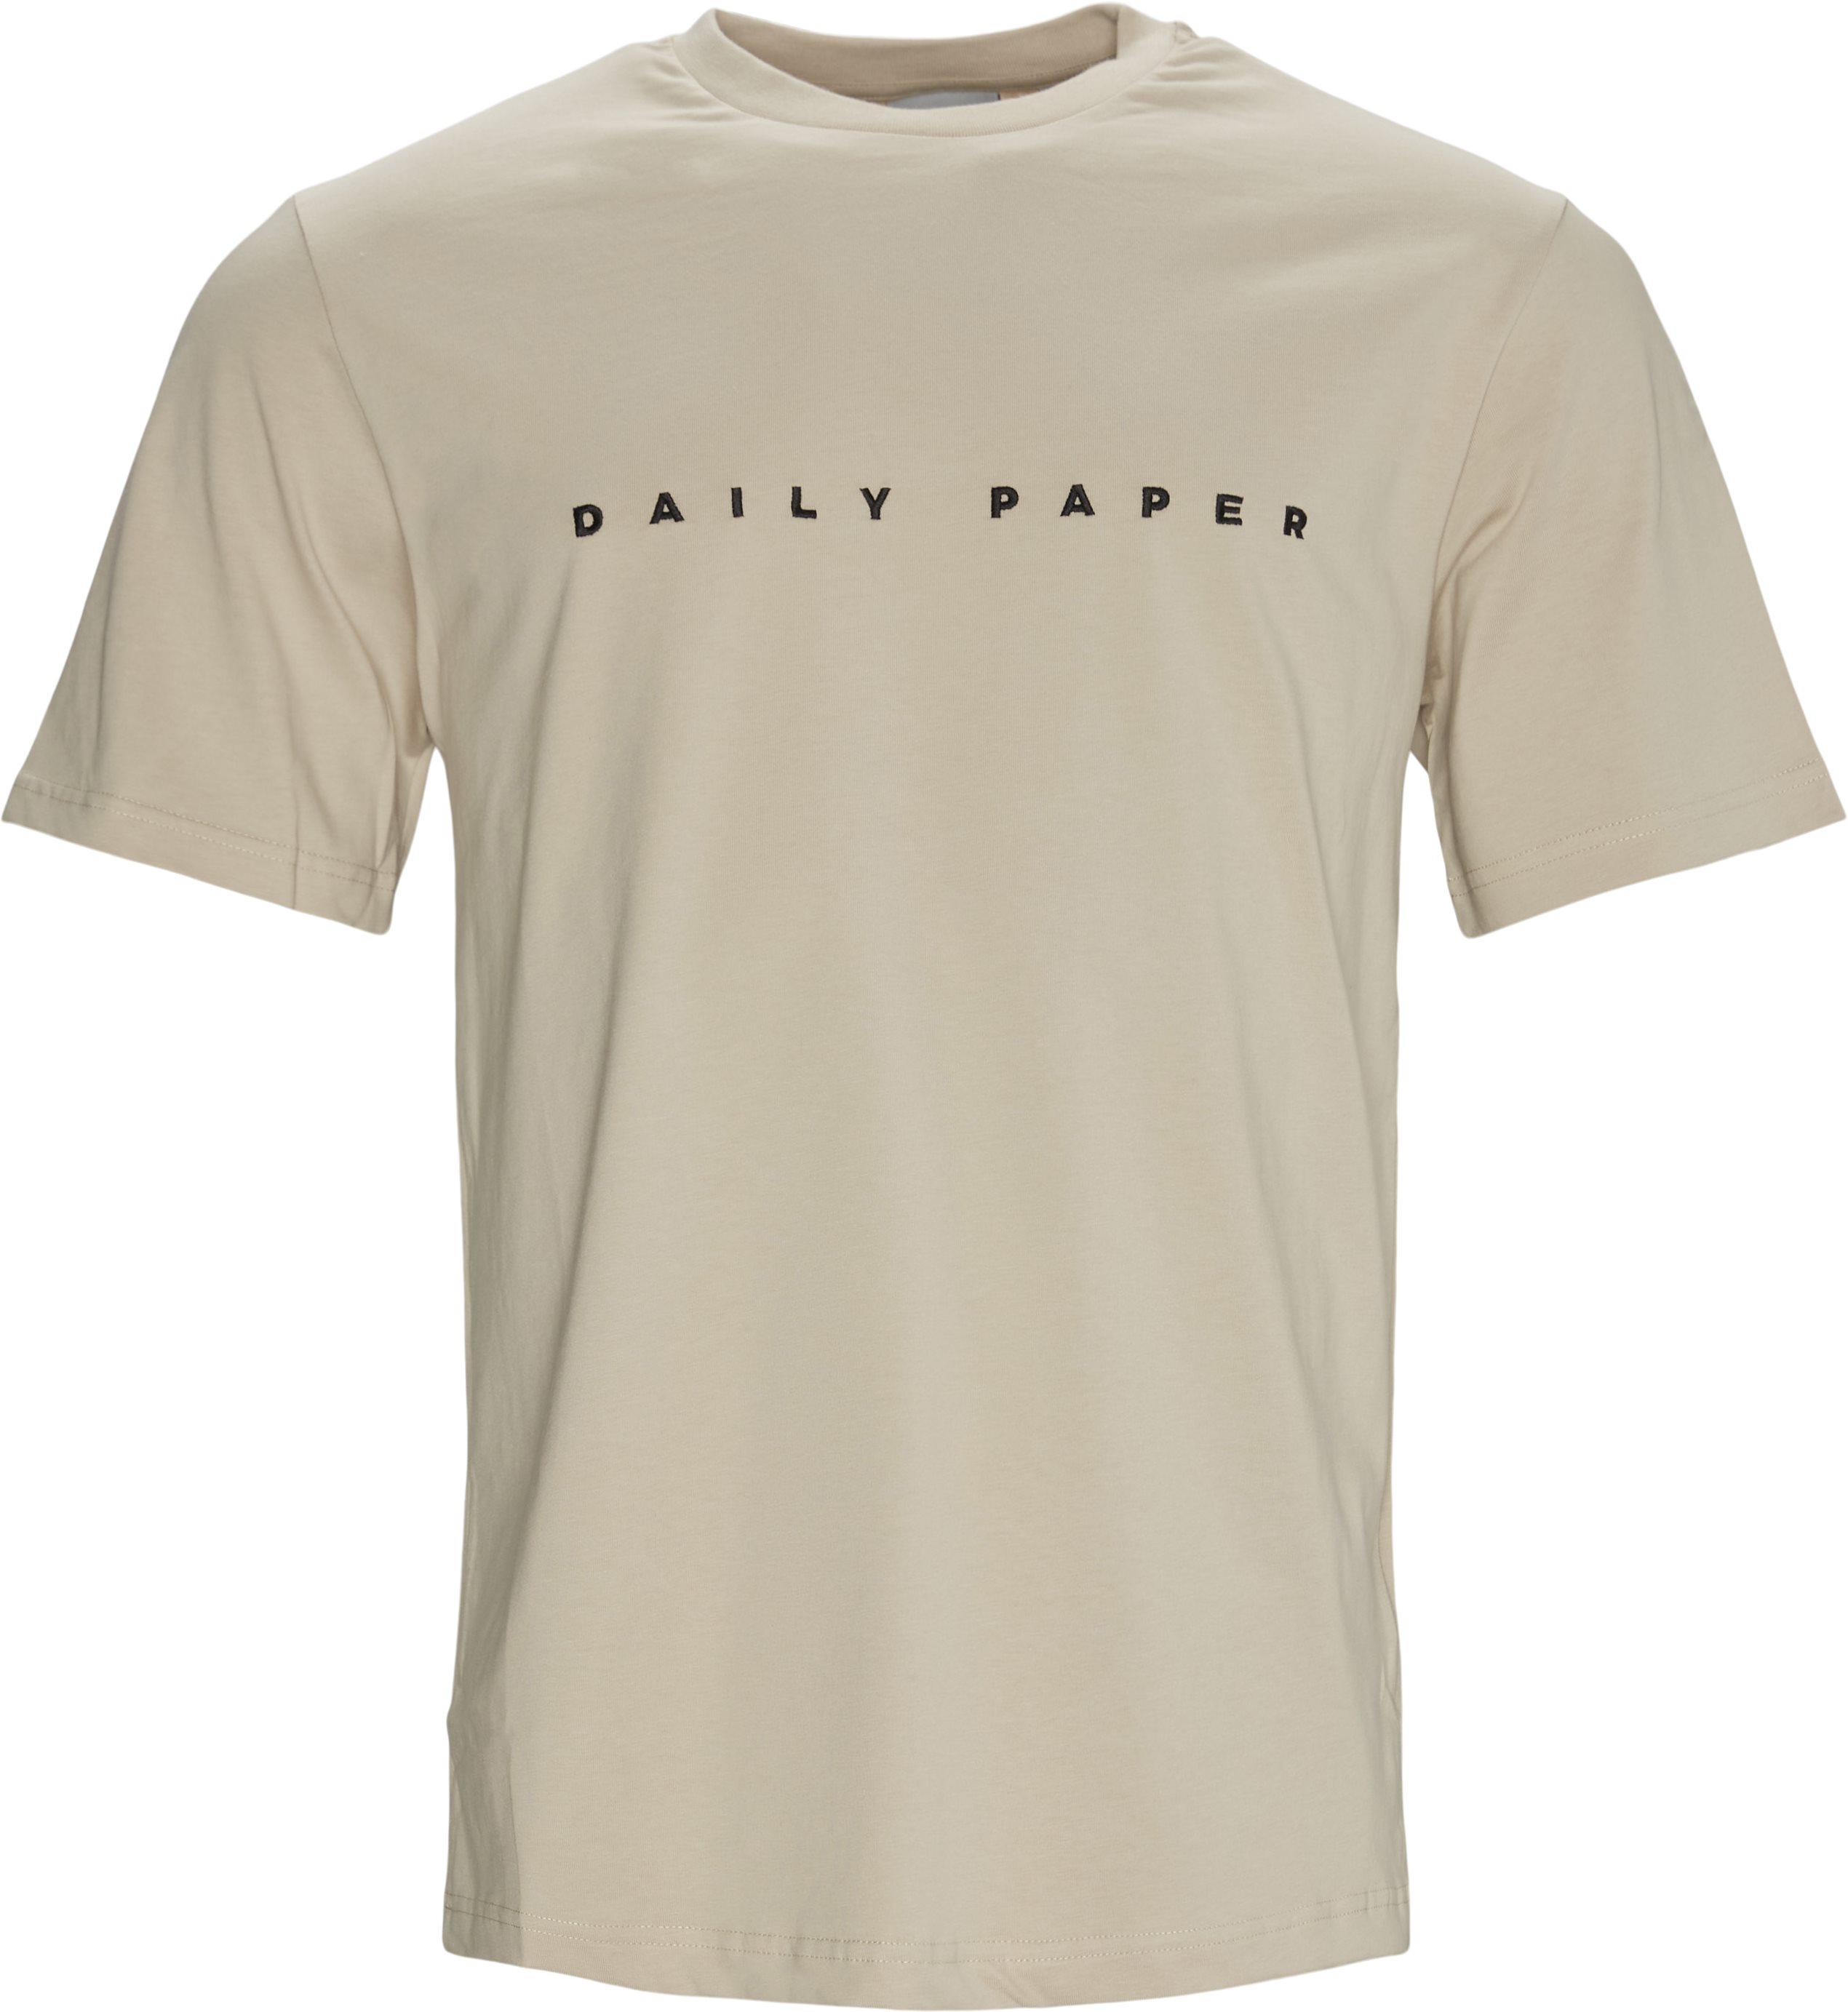 Elias Tee - T-shirts - Regular - Sand